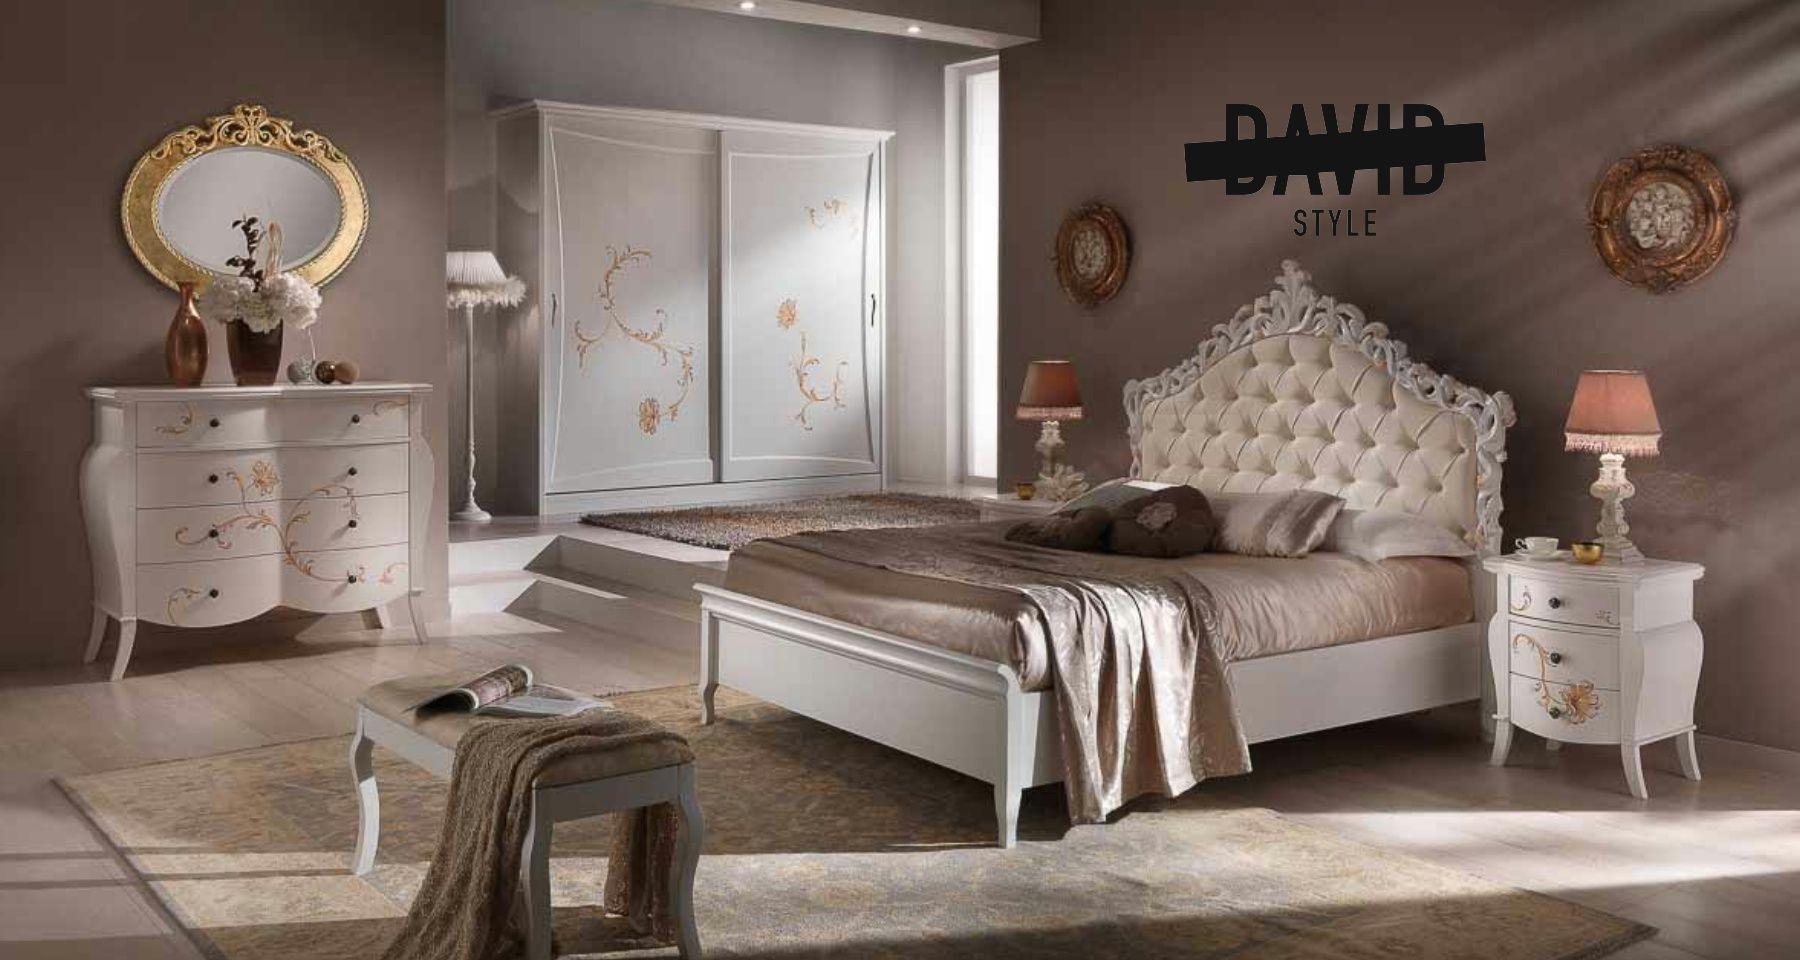 White baroque bedroom Camera barocco bianca